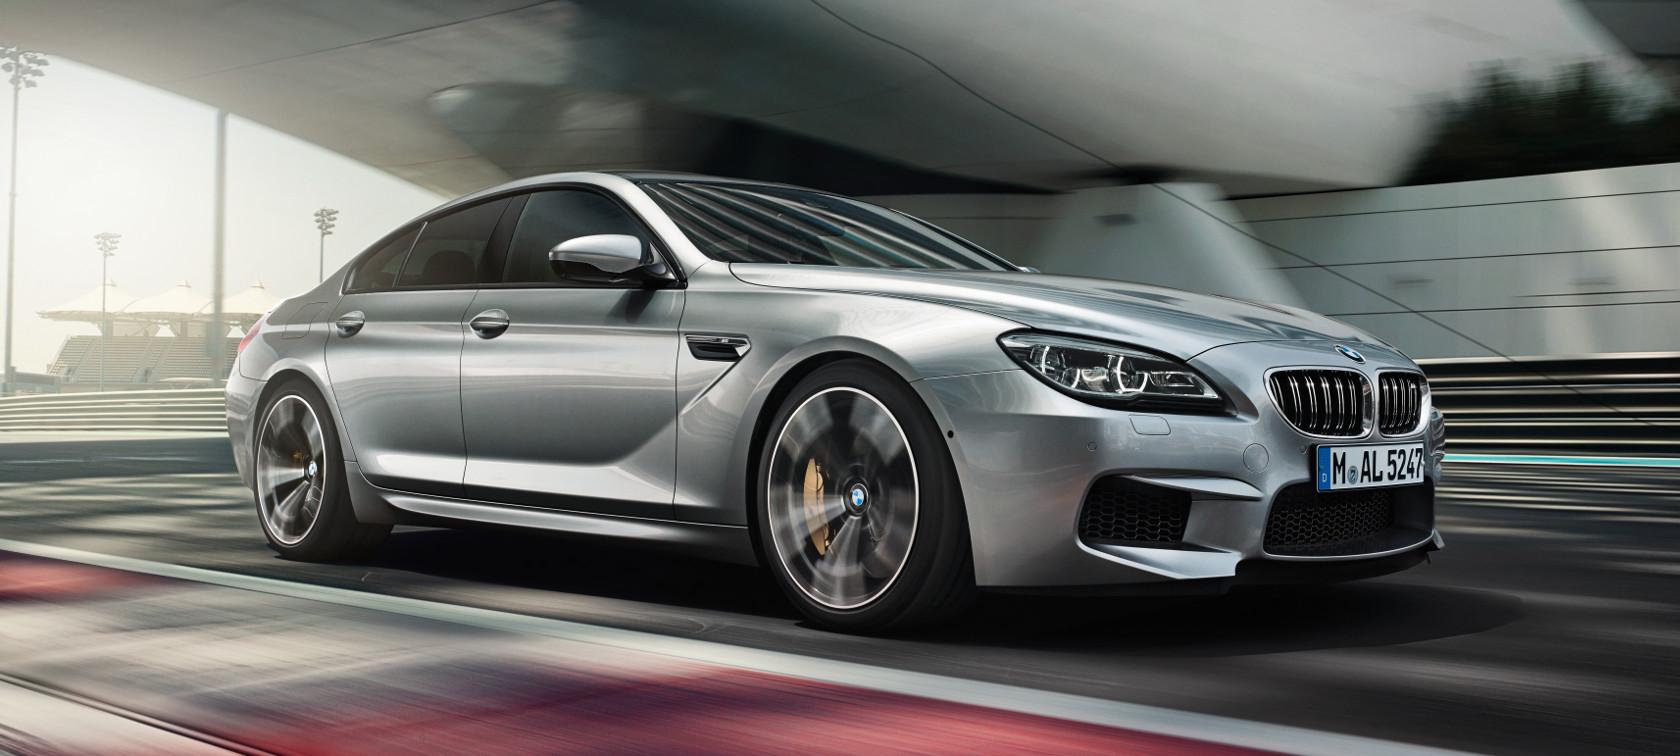 BMW M6 Gran Coupé   Driving Dynamics & Efficiency   BMW Canada